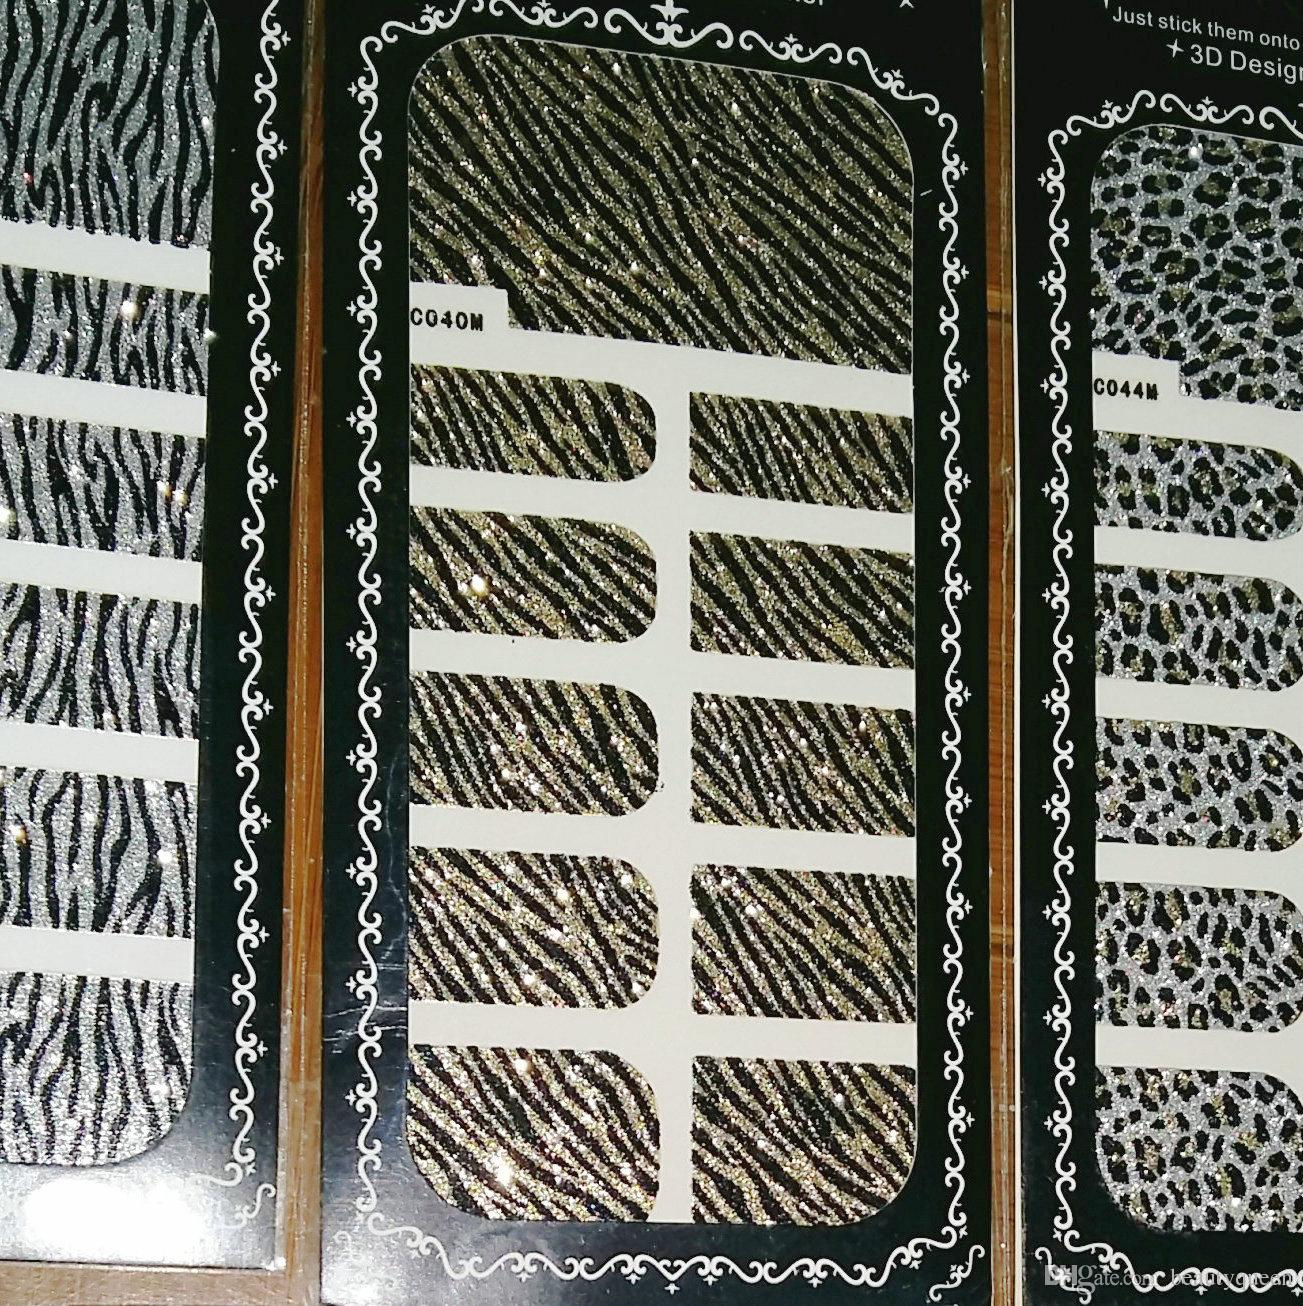 Korea Design Nail Decal Leopard Glitter Nail Art Wrap Wraps Sticker Foils Tips Decal Decoration Adhesive Applique * High Quality NEW Fashion